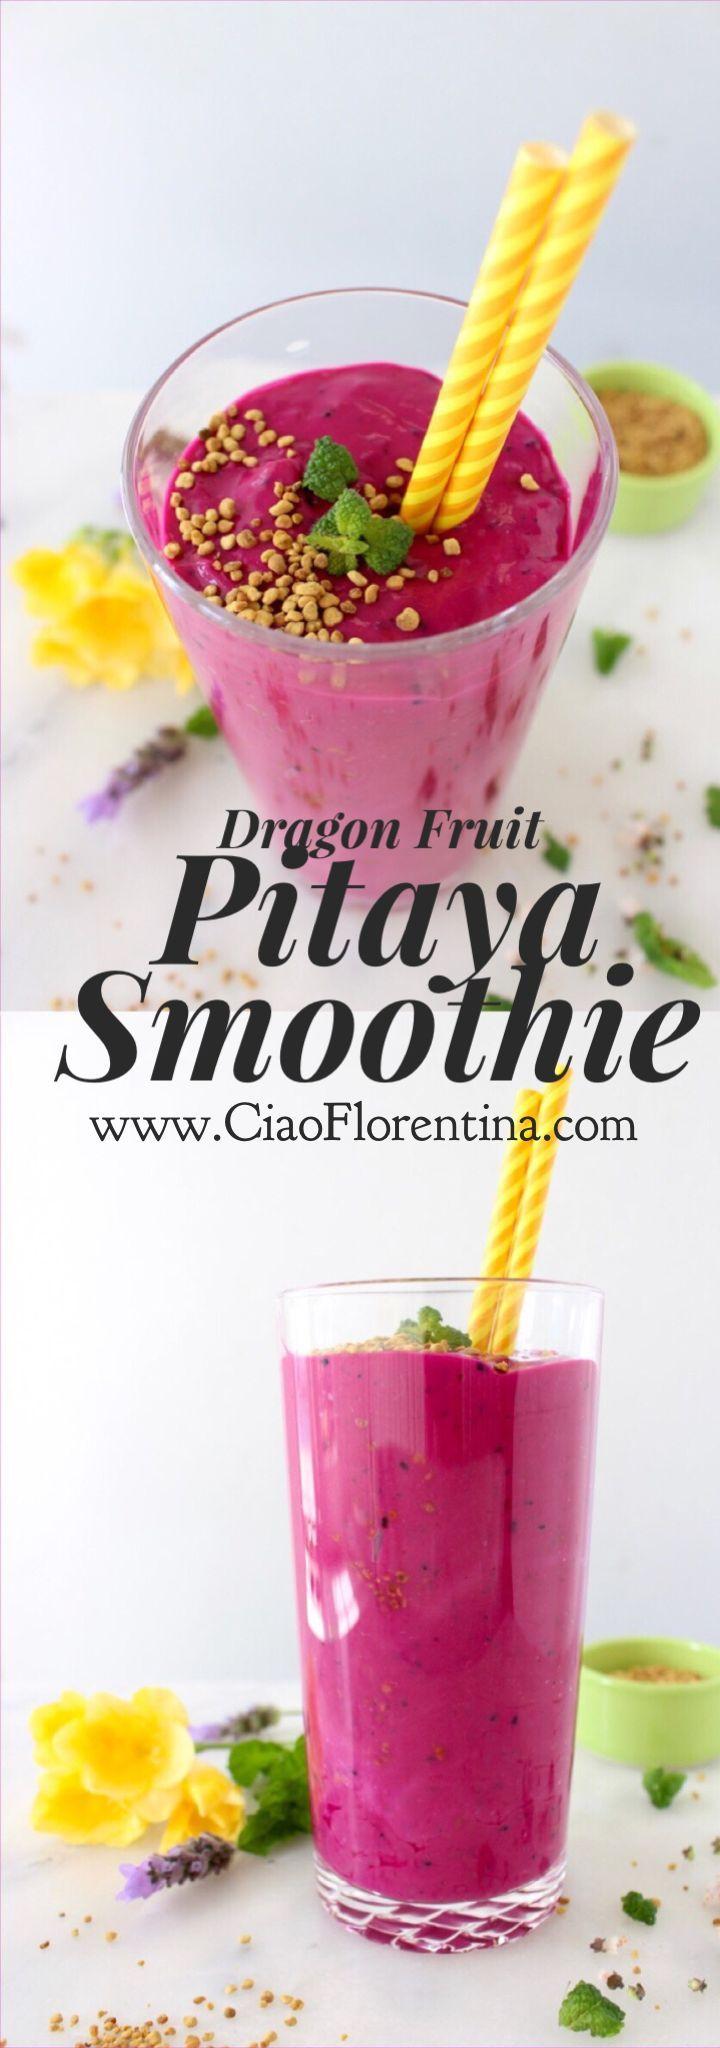 Dragon Fruit Pitaya Smoothie Recipe | CiaoFlorentina.com @CiaoFlorentina